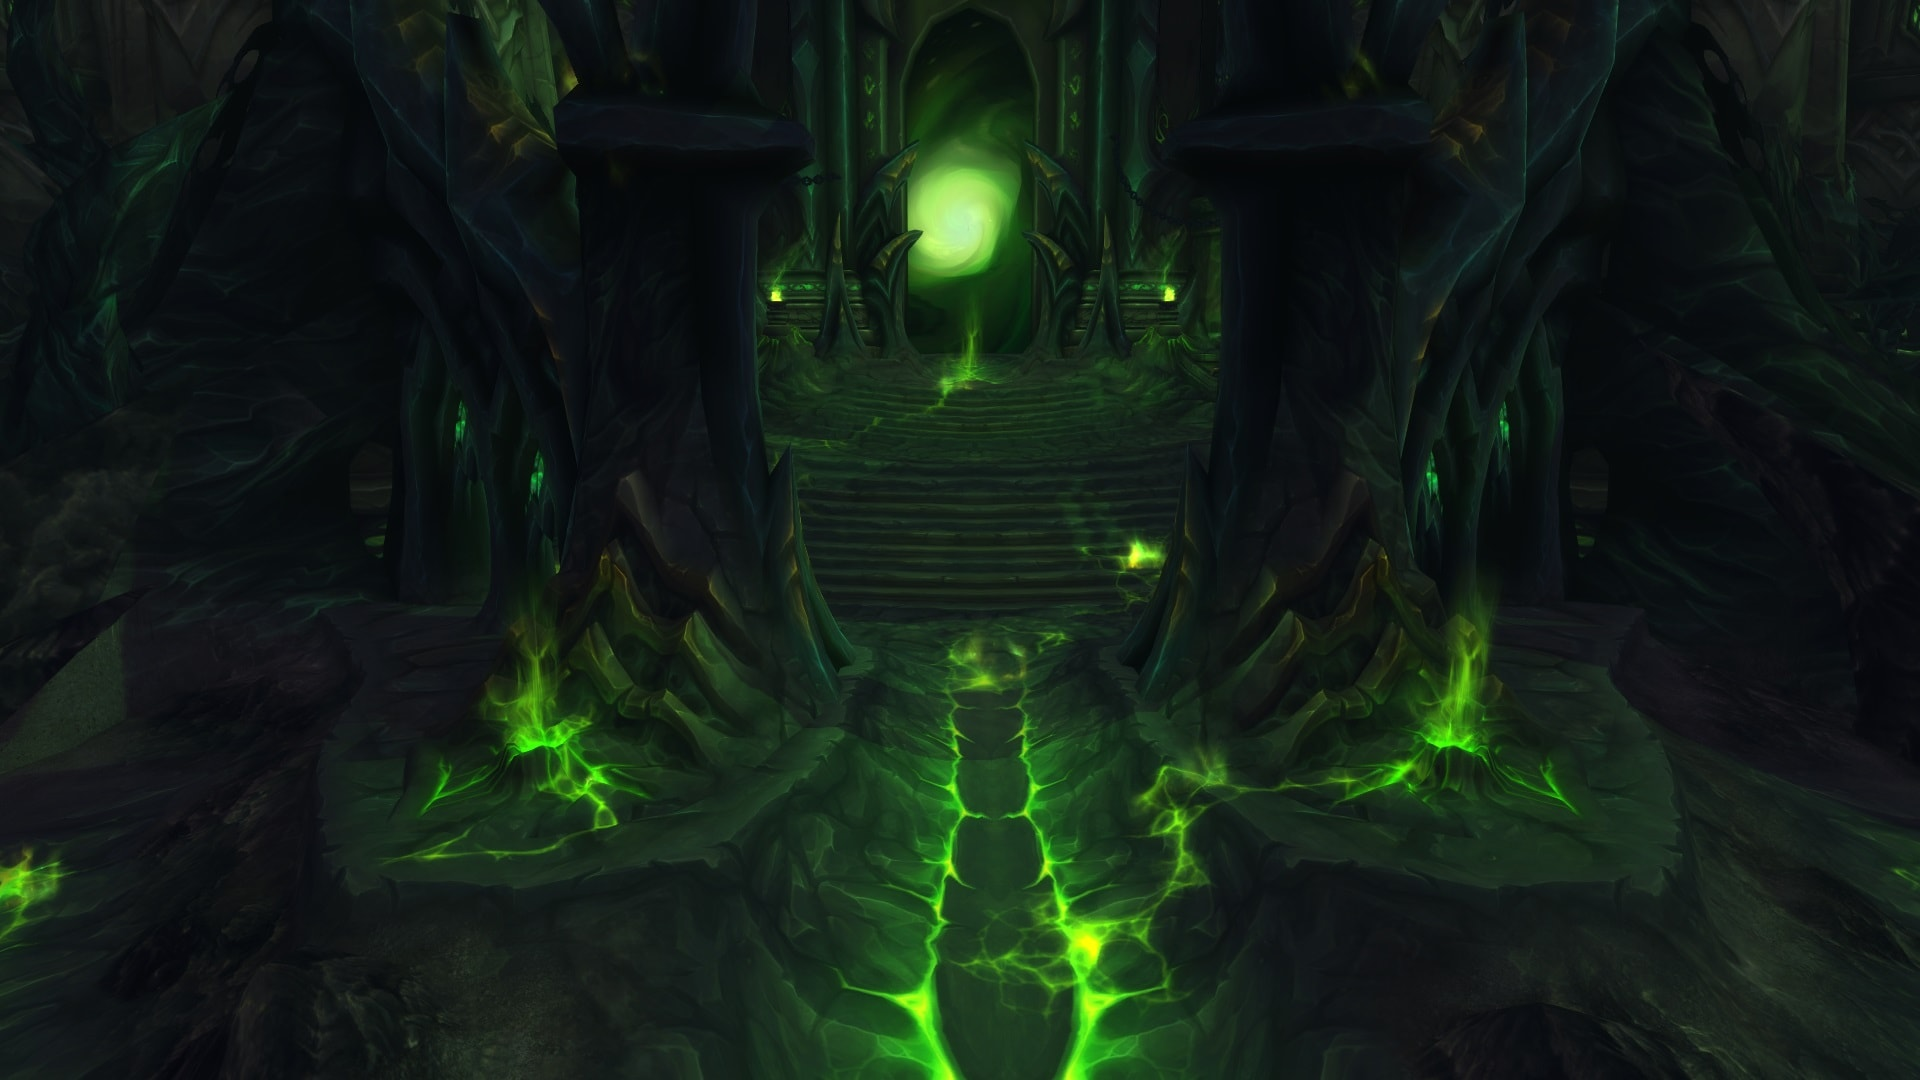 World Of Warcraft Legion Hd Wallpapers 7wallpapers Net